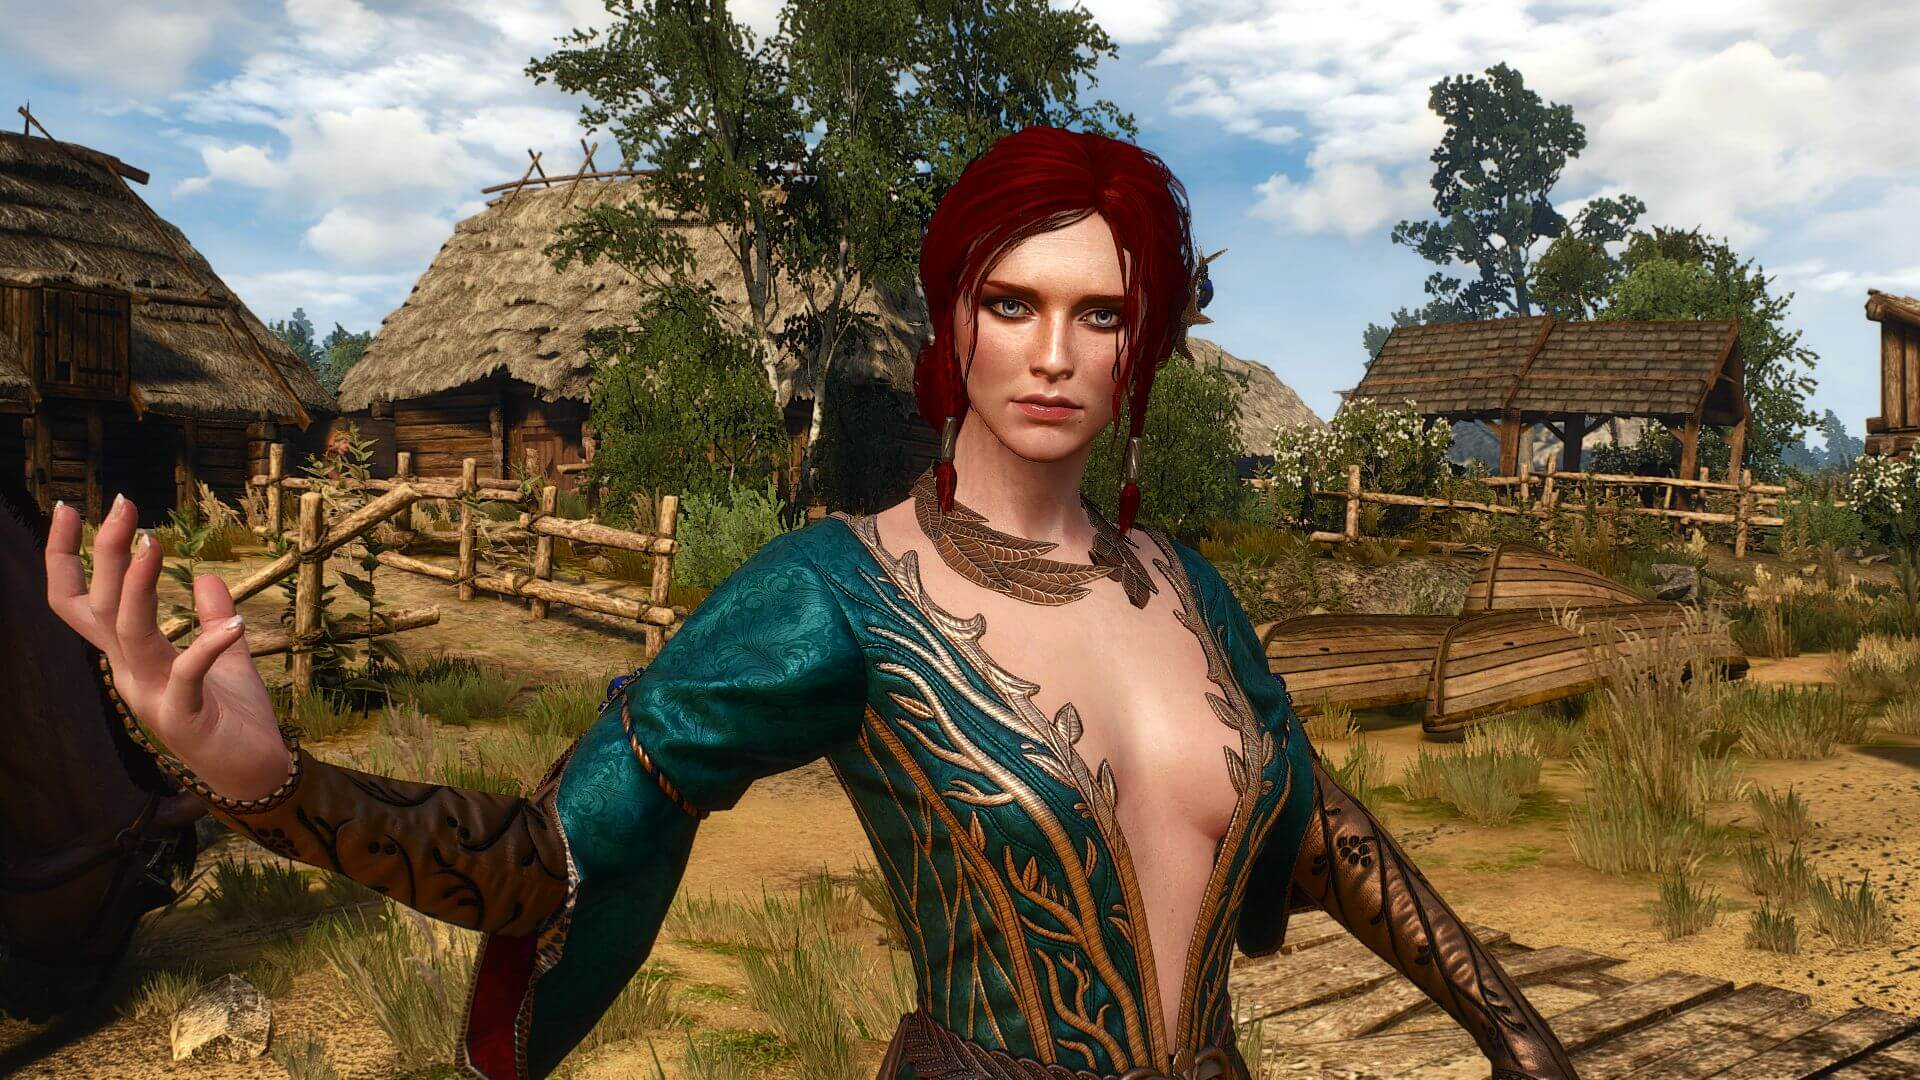 4K Reworked Women mod (18+)